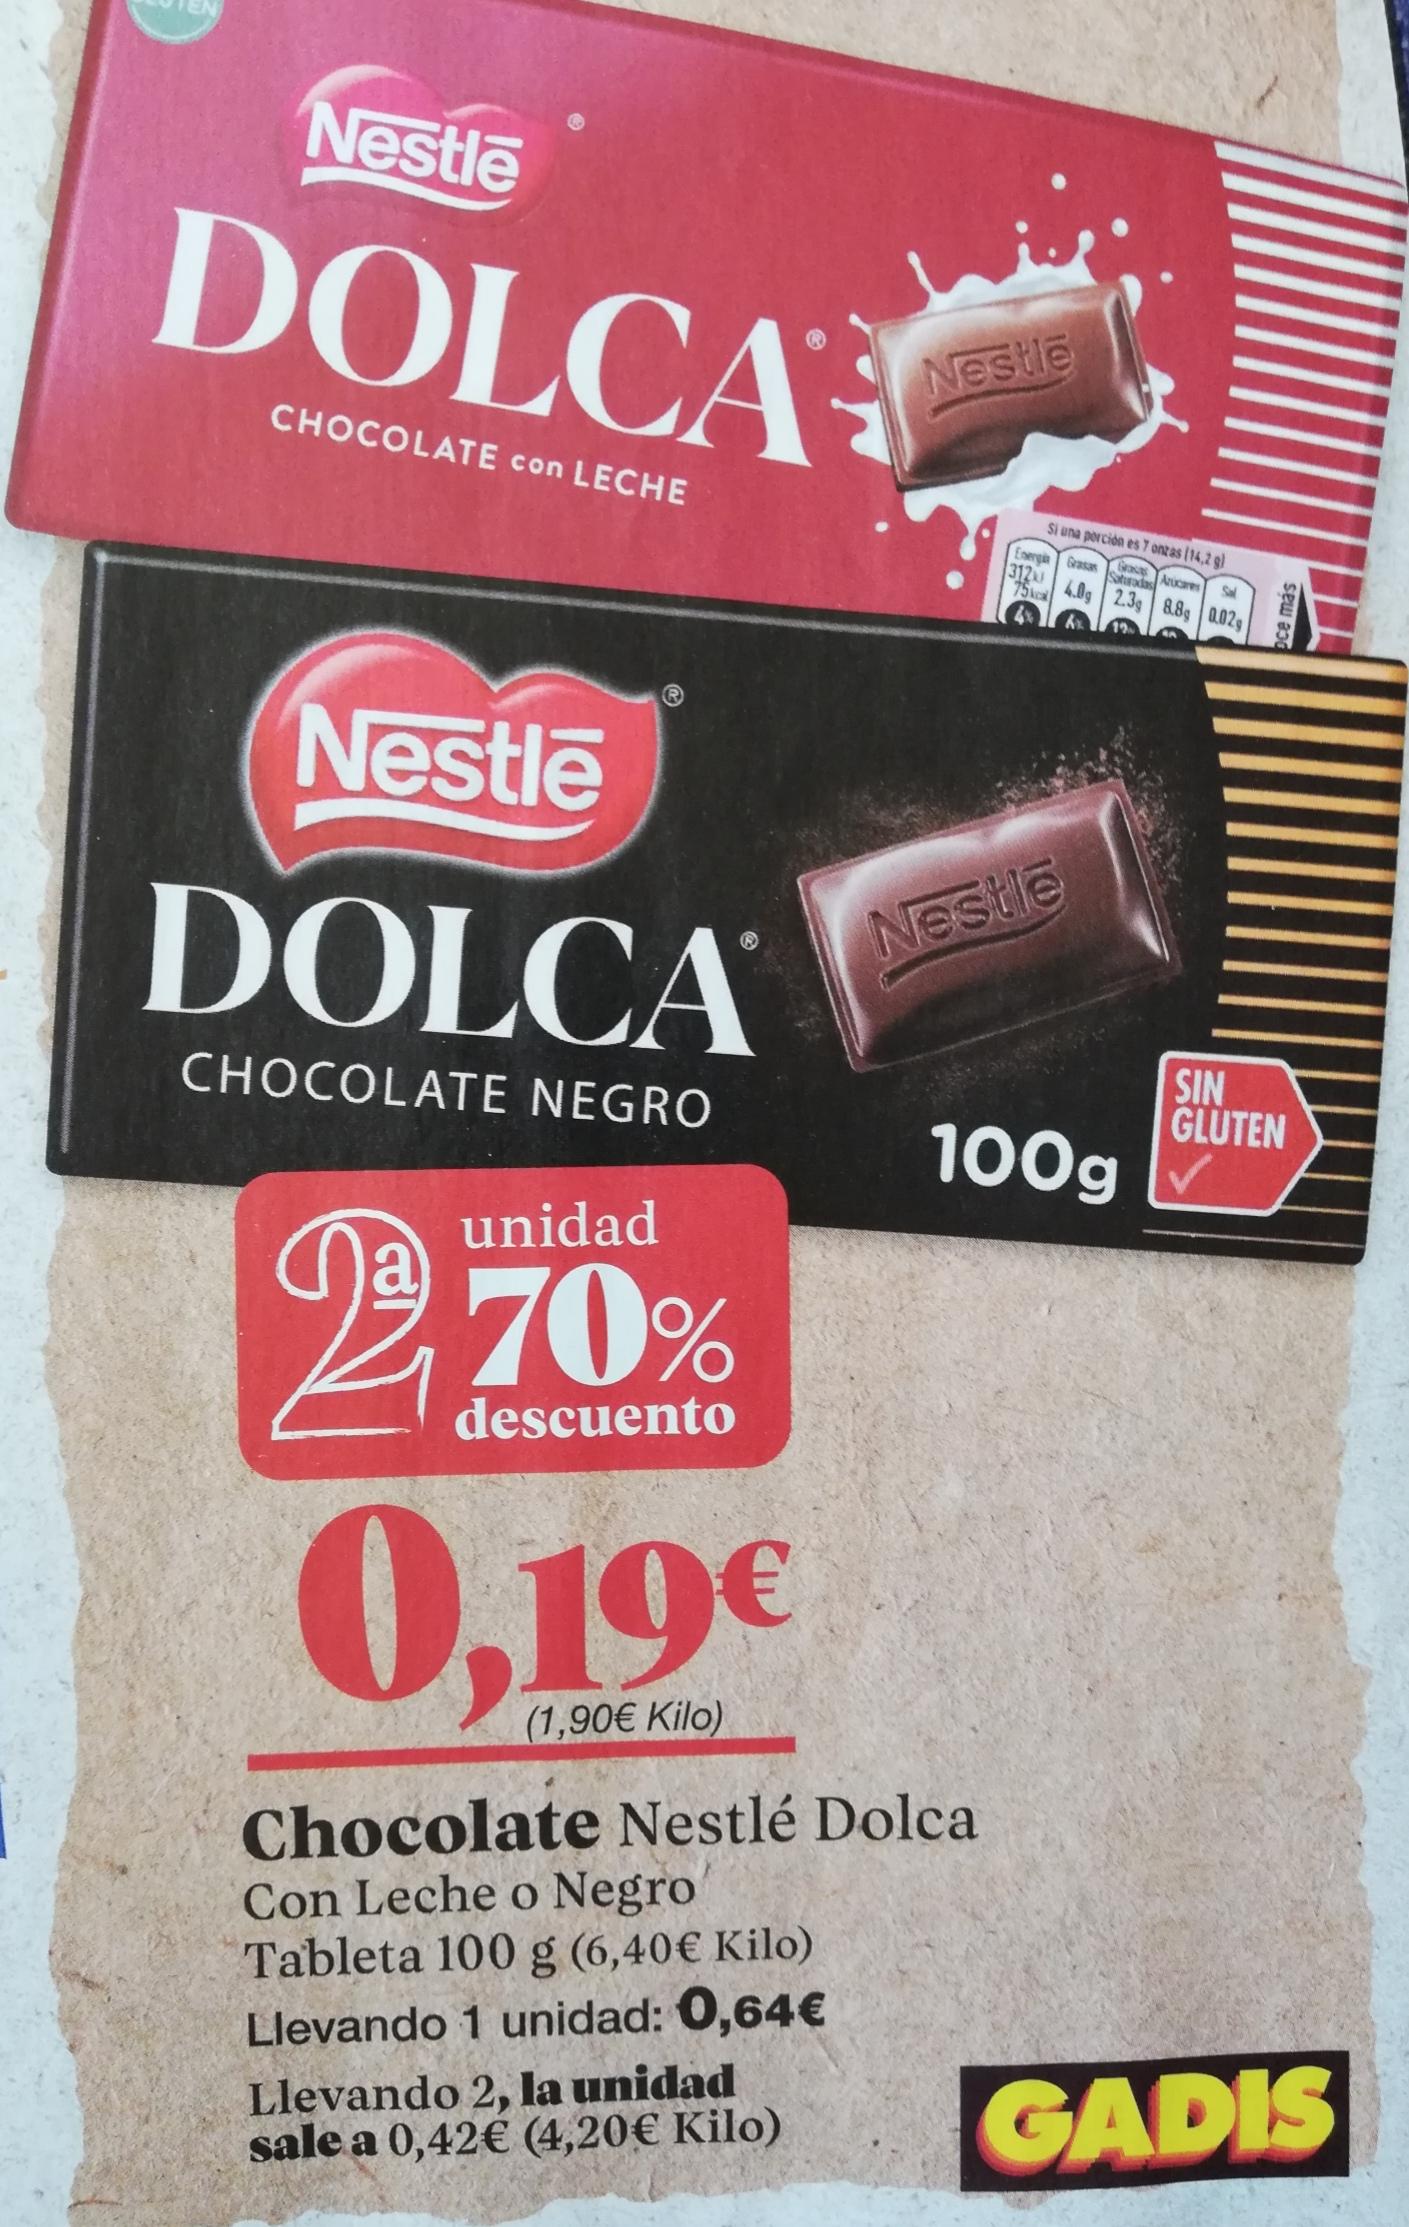 Chocolate Dolca (Nestlé). Gadis